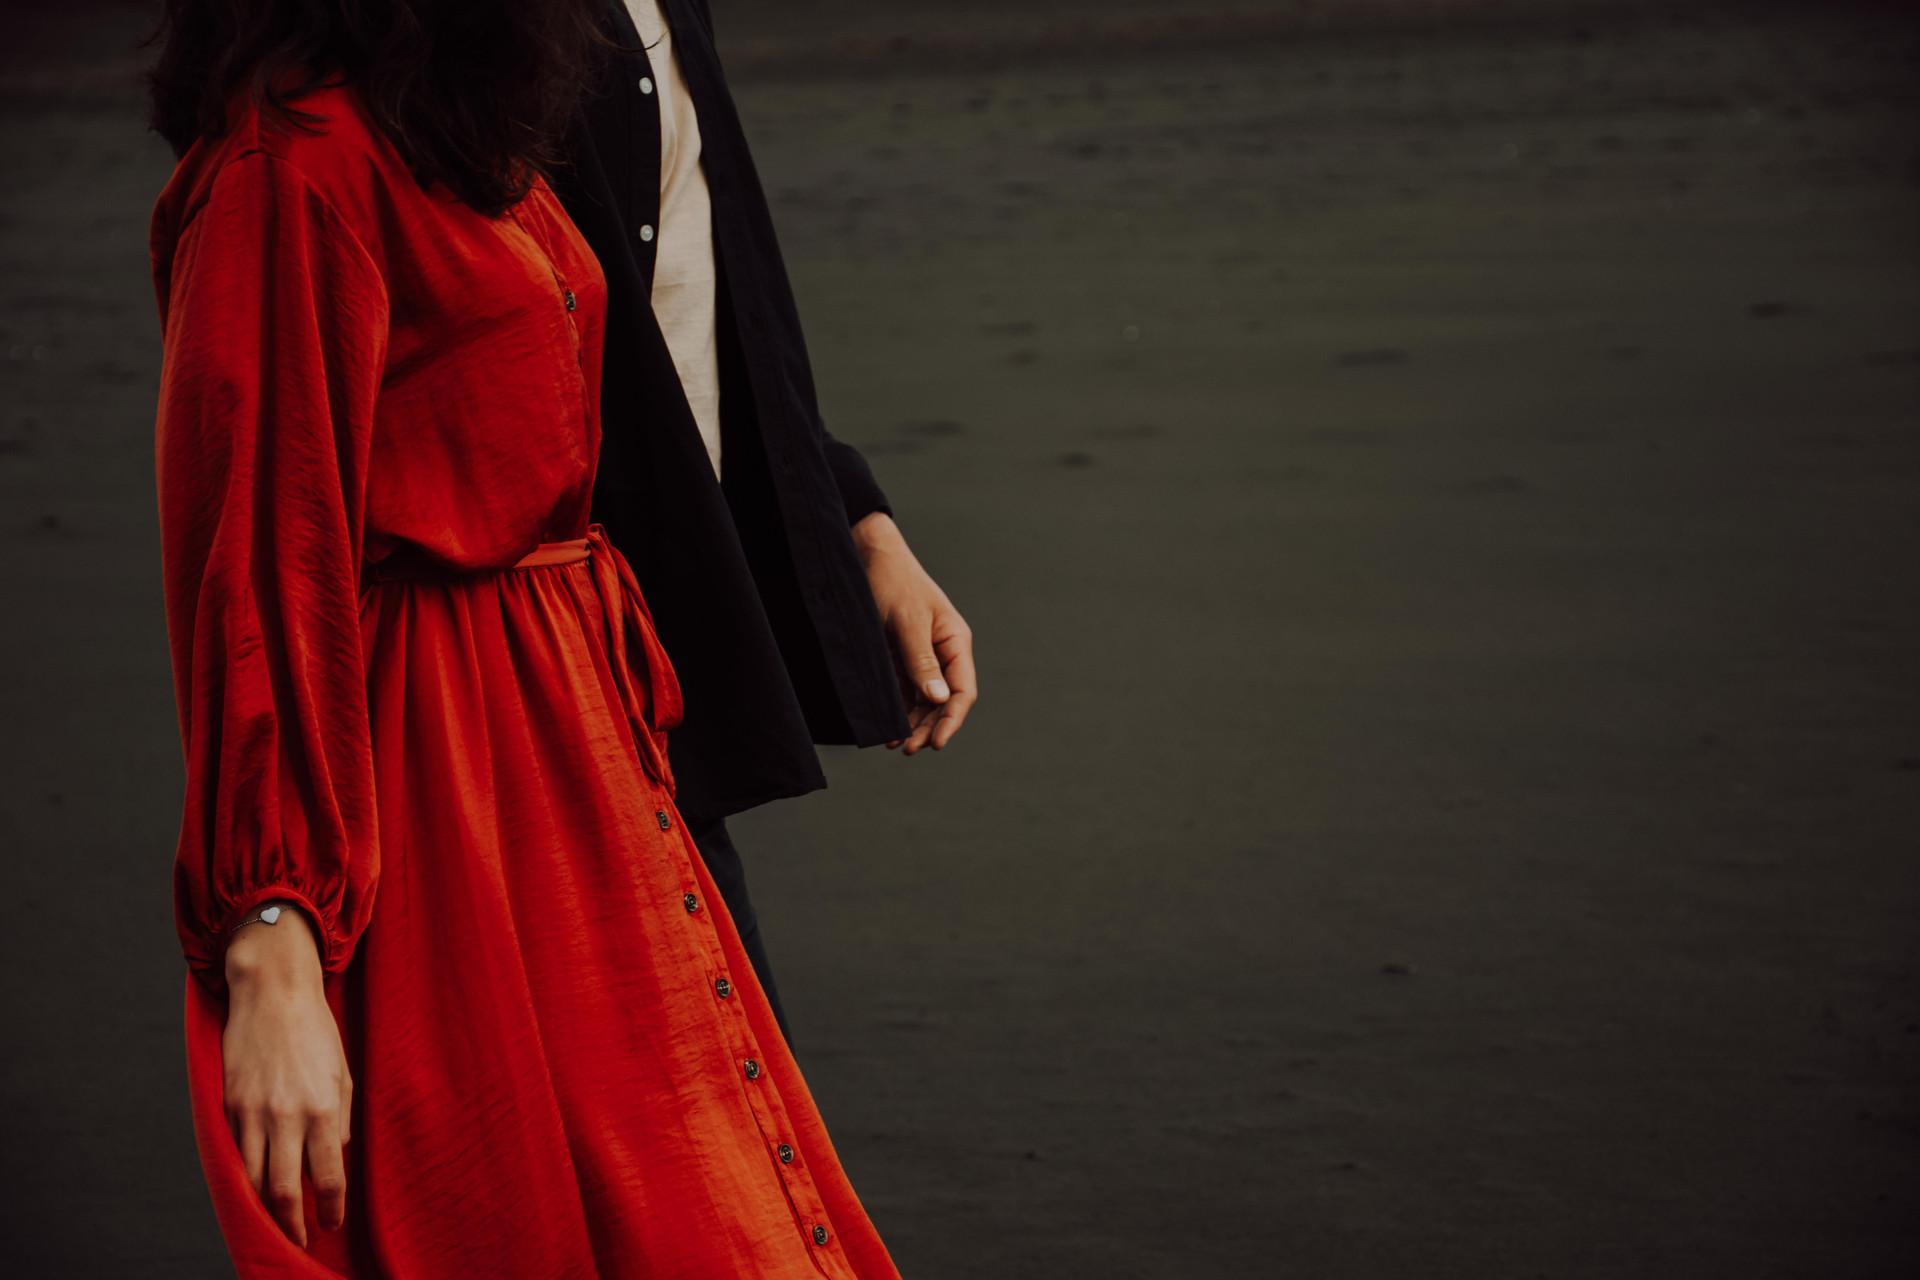 Sunset engagement photoshoot at Muriwai Beach in Auckland New Zealand - www.zanthevorsatzphotography.com